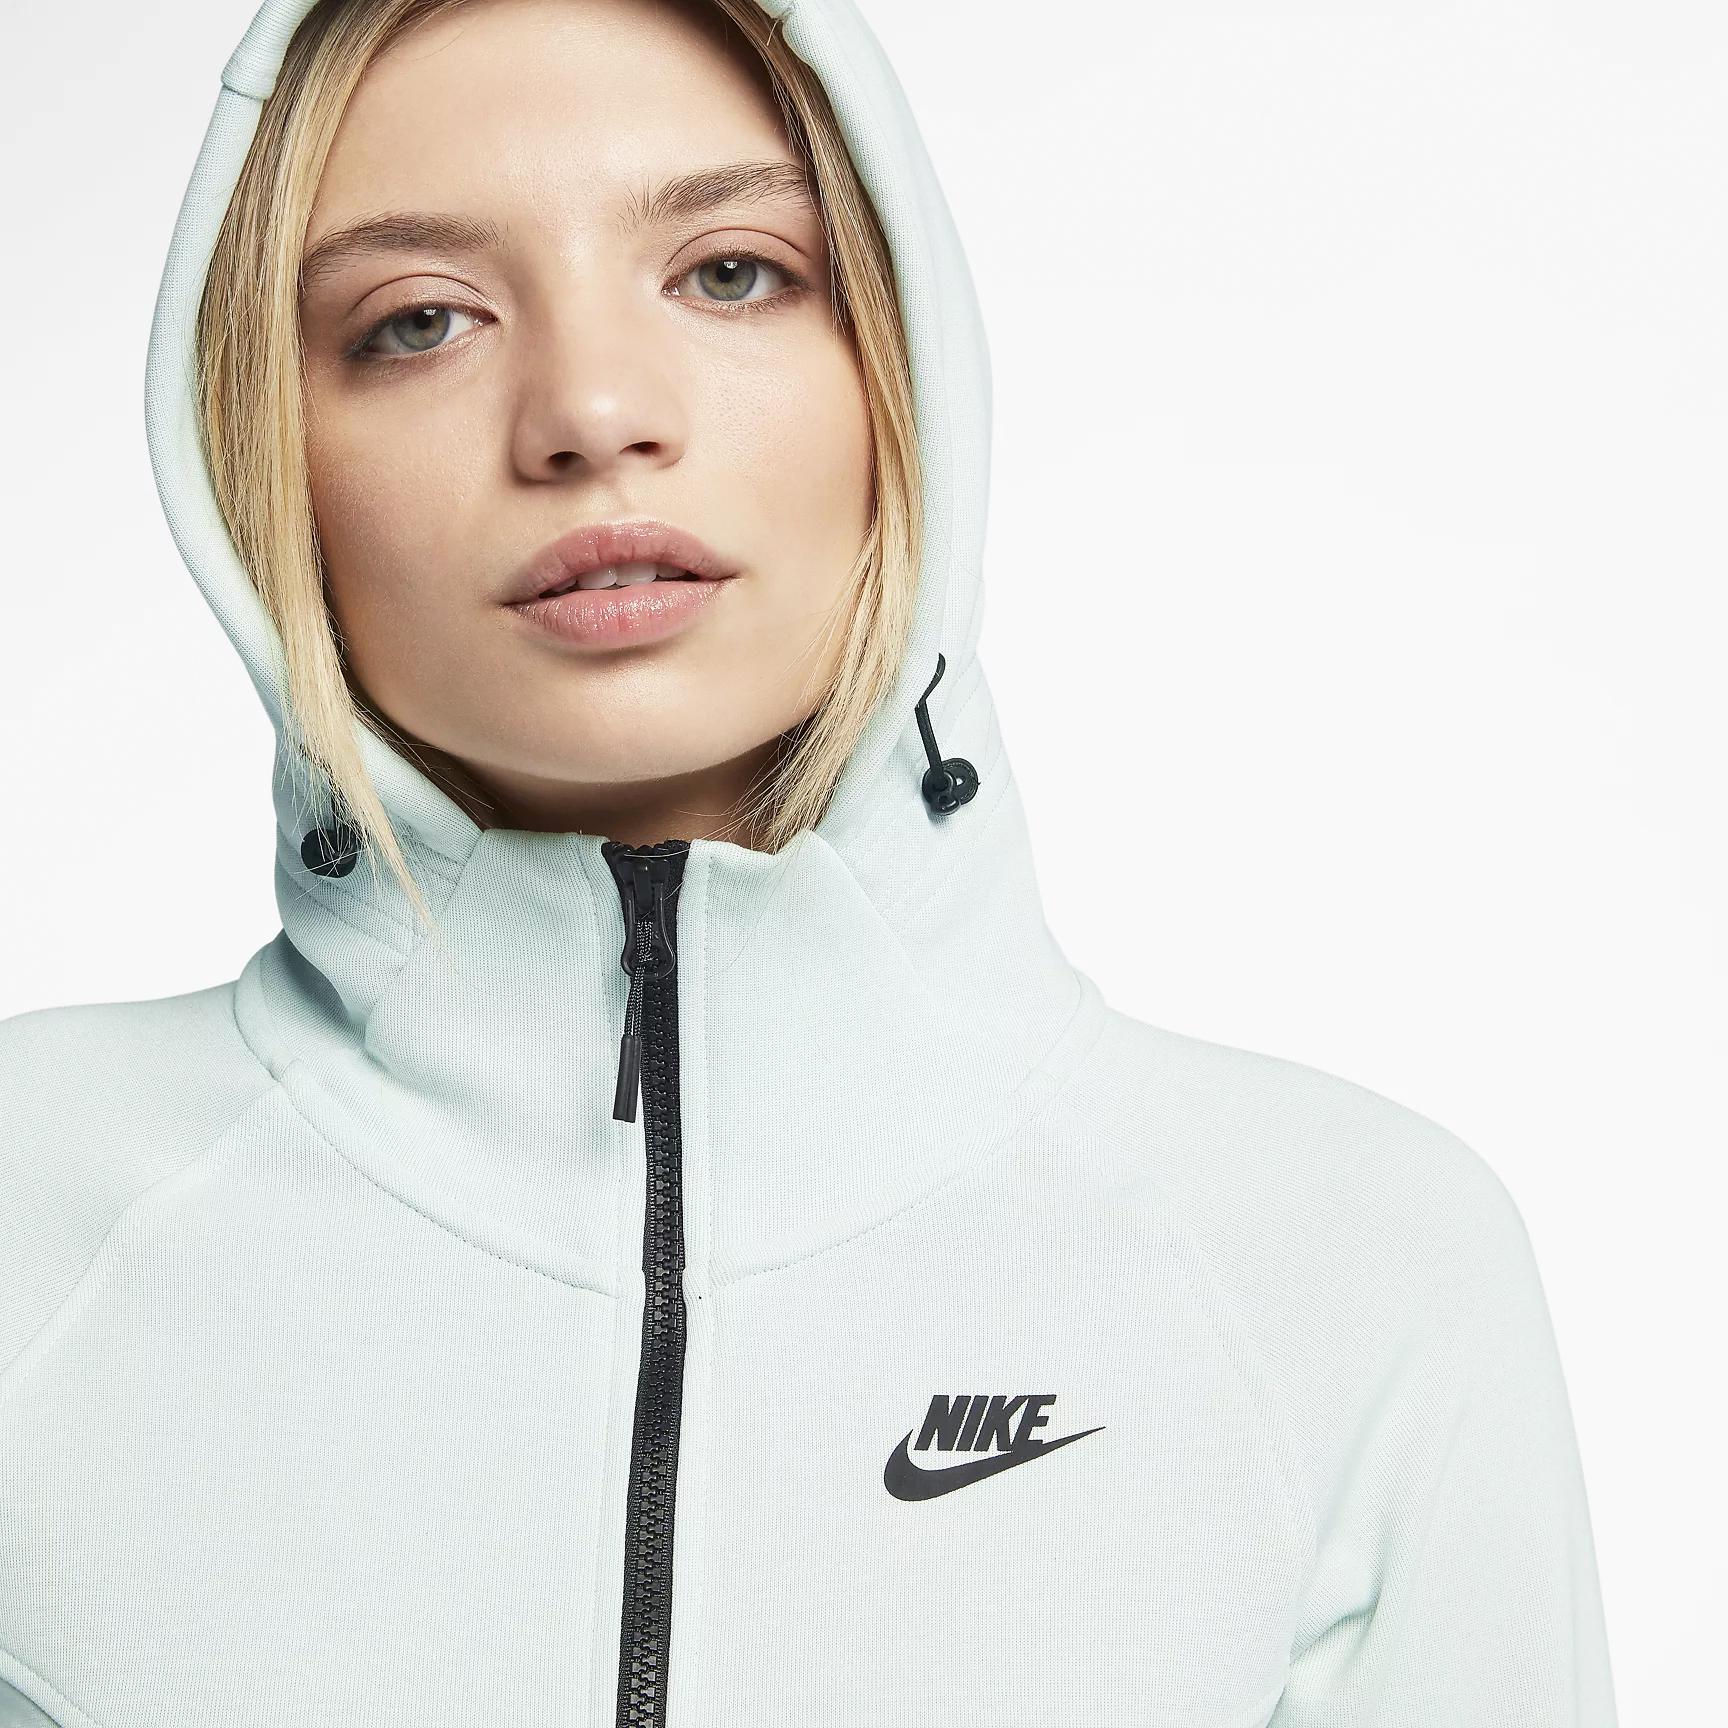 NikeSS18_15.JPG